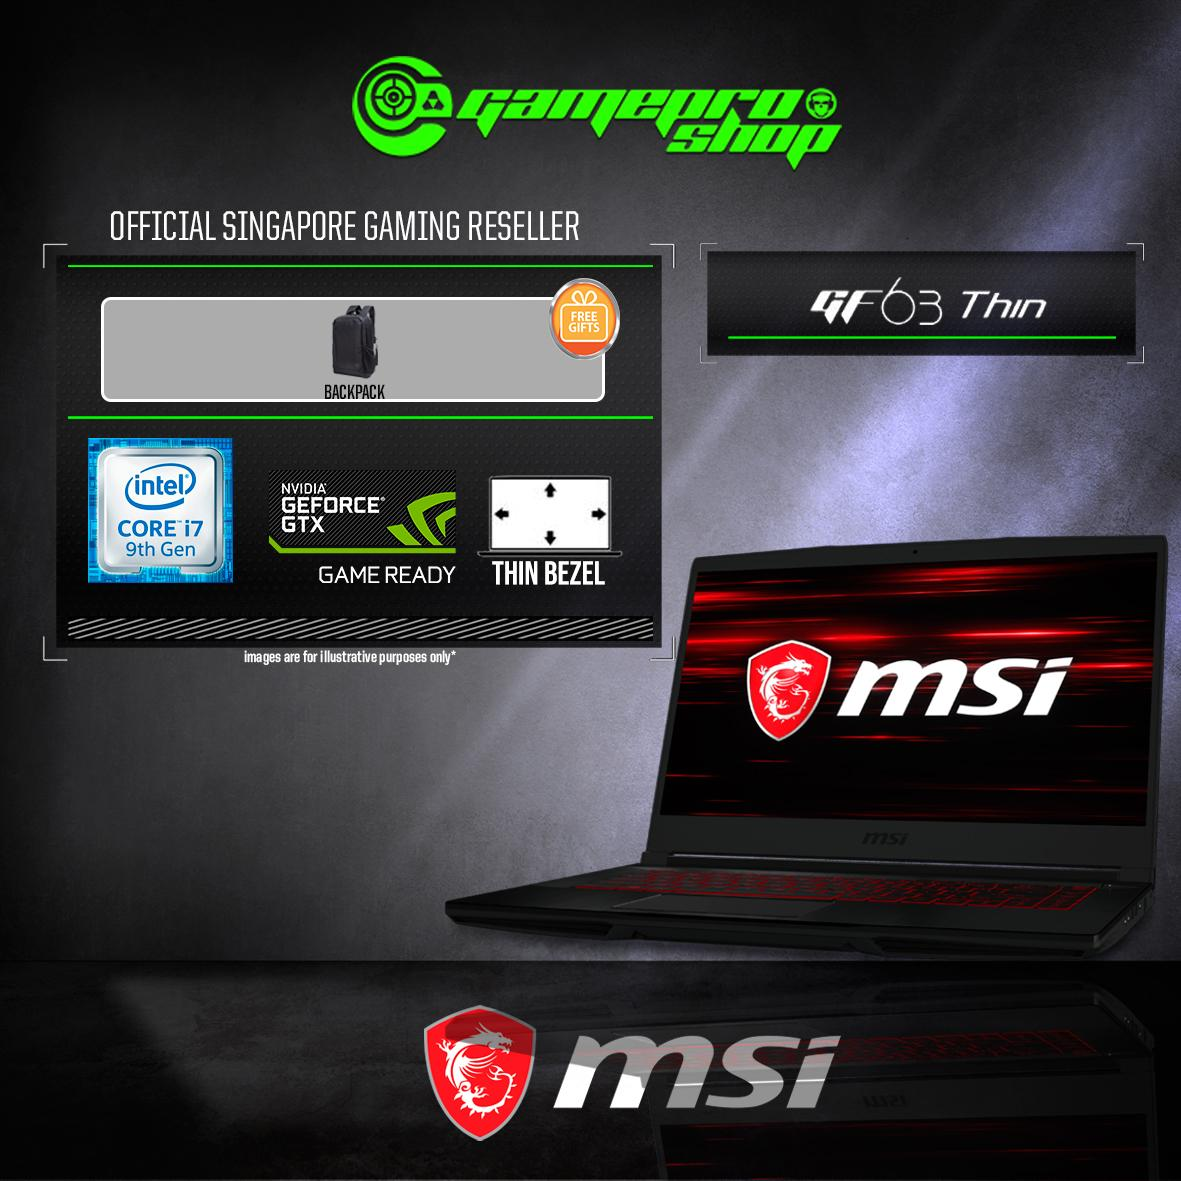 9th Gen MSI GF63 GTX1650 THIN 9SC - 259SG (i7-9750H / 8GB / 512GB / WIN 10) 15.6 FHD GAMING LAPTOP *GSS PROMO*